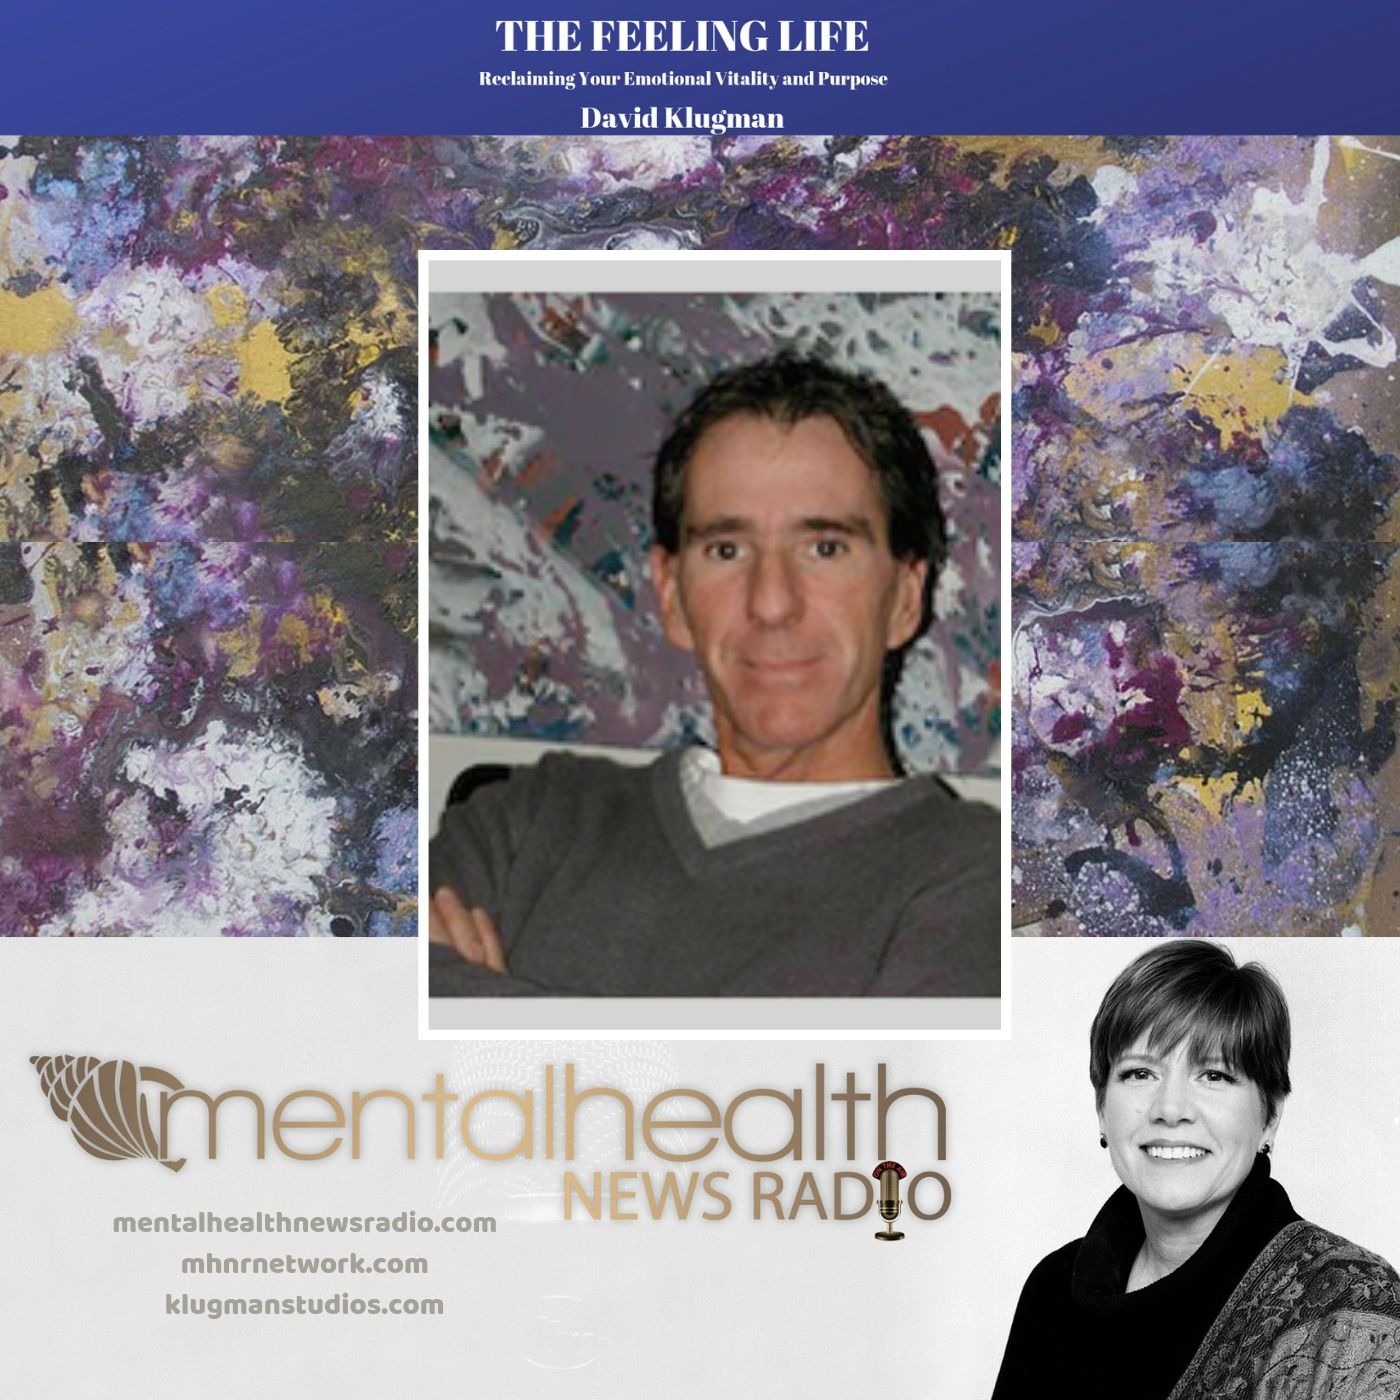 Mental Health News Radio - The Feeling Life with David Klugman: Empathy